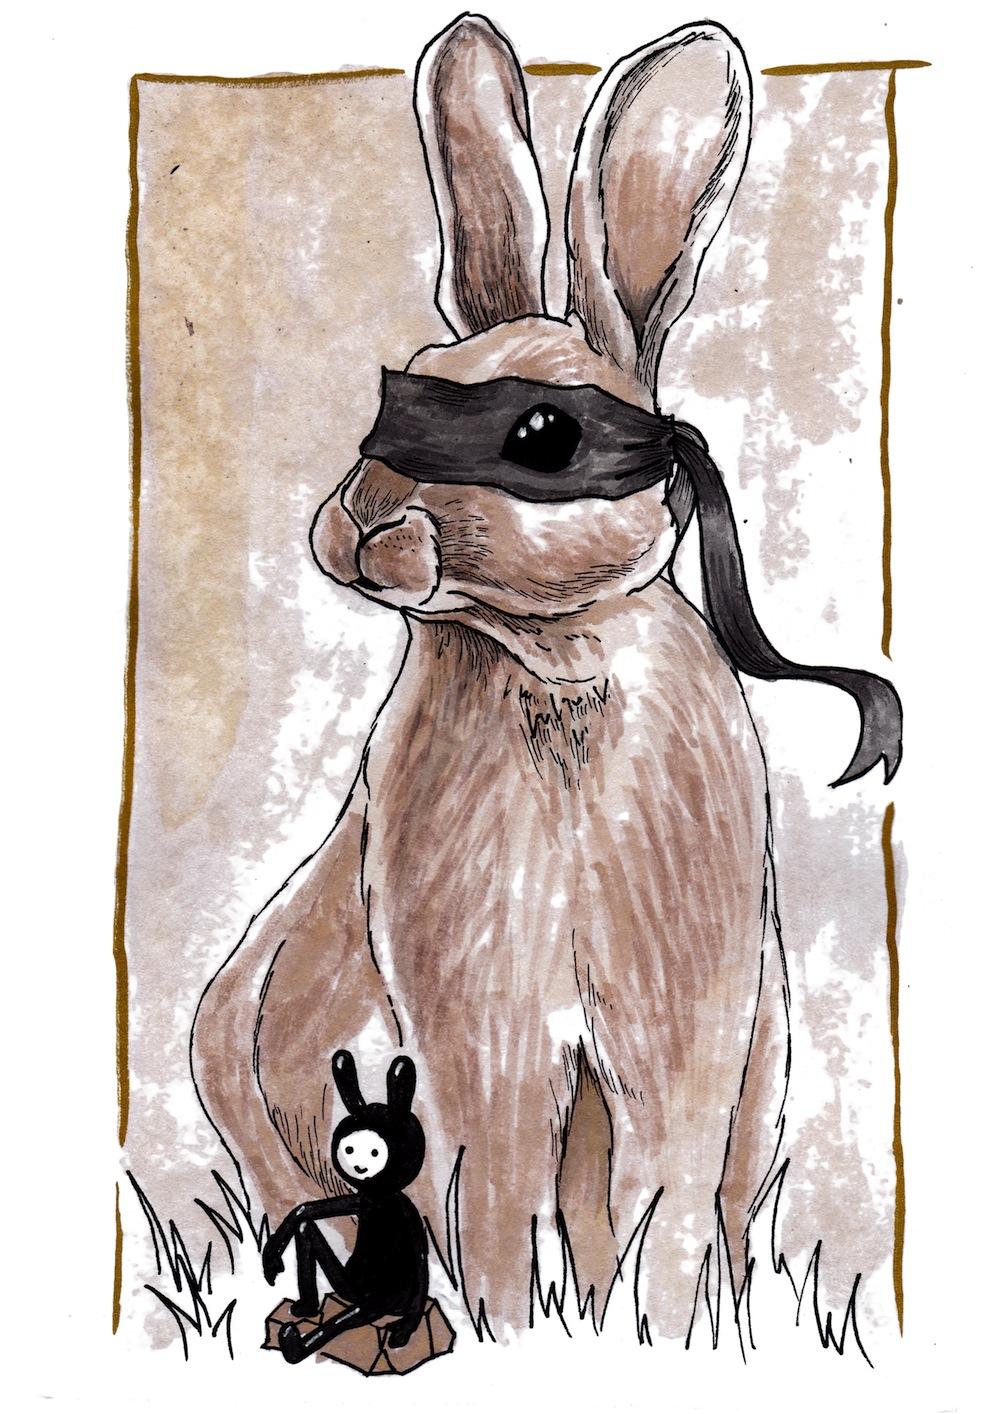 bandit_bunny_2.jpg